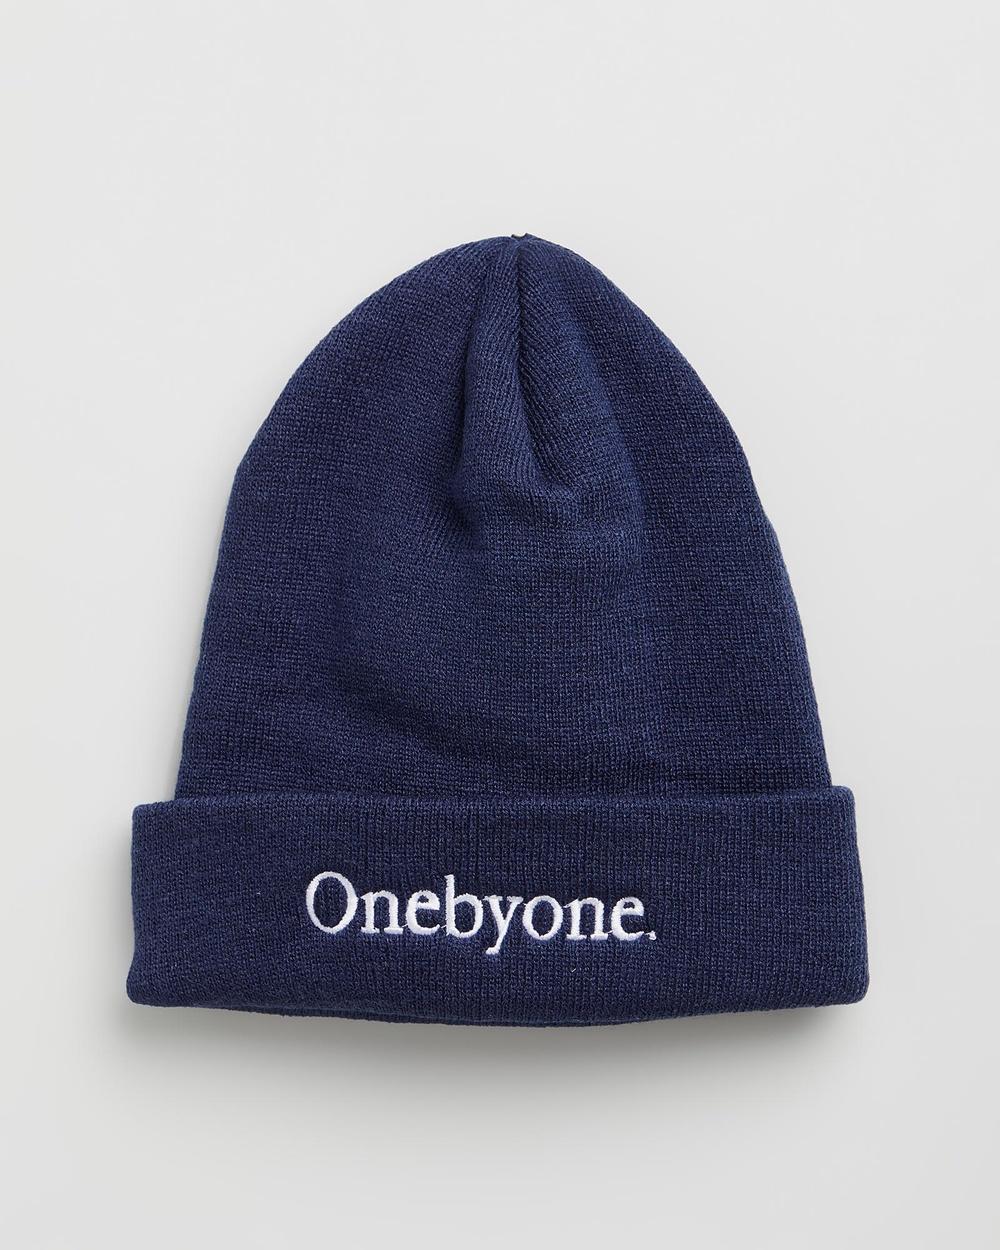 ONEBYONE Mariner Beanie Headwear Blue